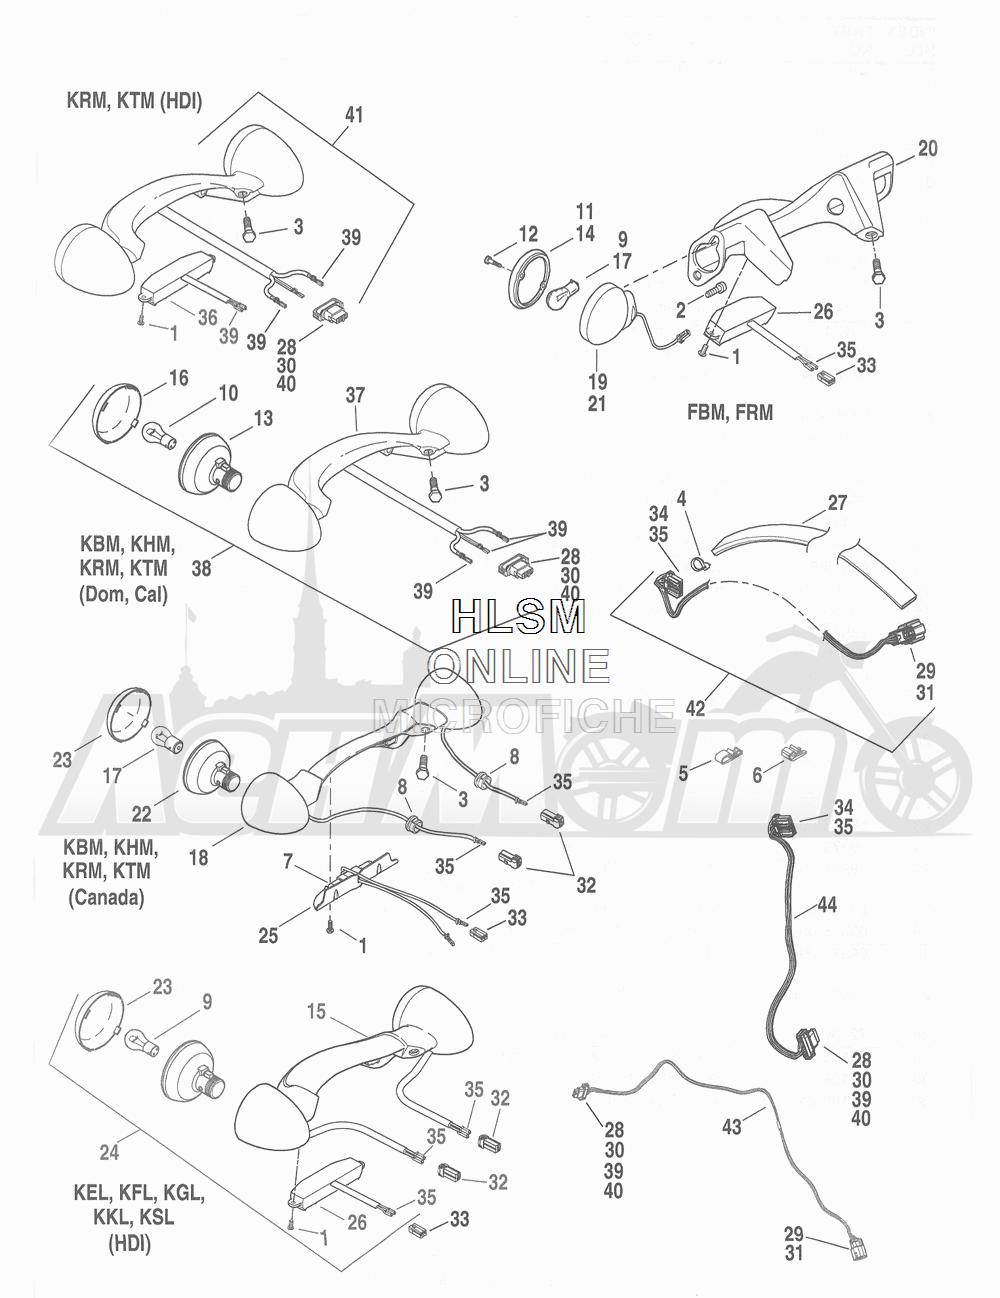 Запчасти для Мотоцикла Harley-Davidson 2016 FLHR ROAD KING (FBM) Раздел: TURN SIGNALS - REAR W/ TAIL LIGHT - REAR | сигналы поворота зад вместе с задний фонарь зад